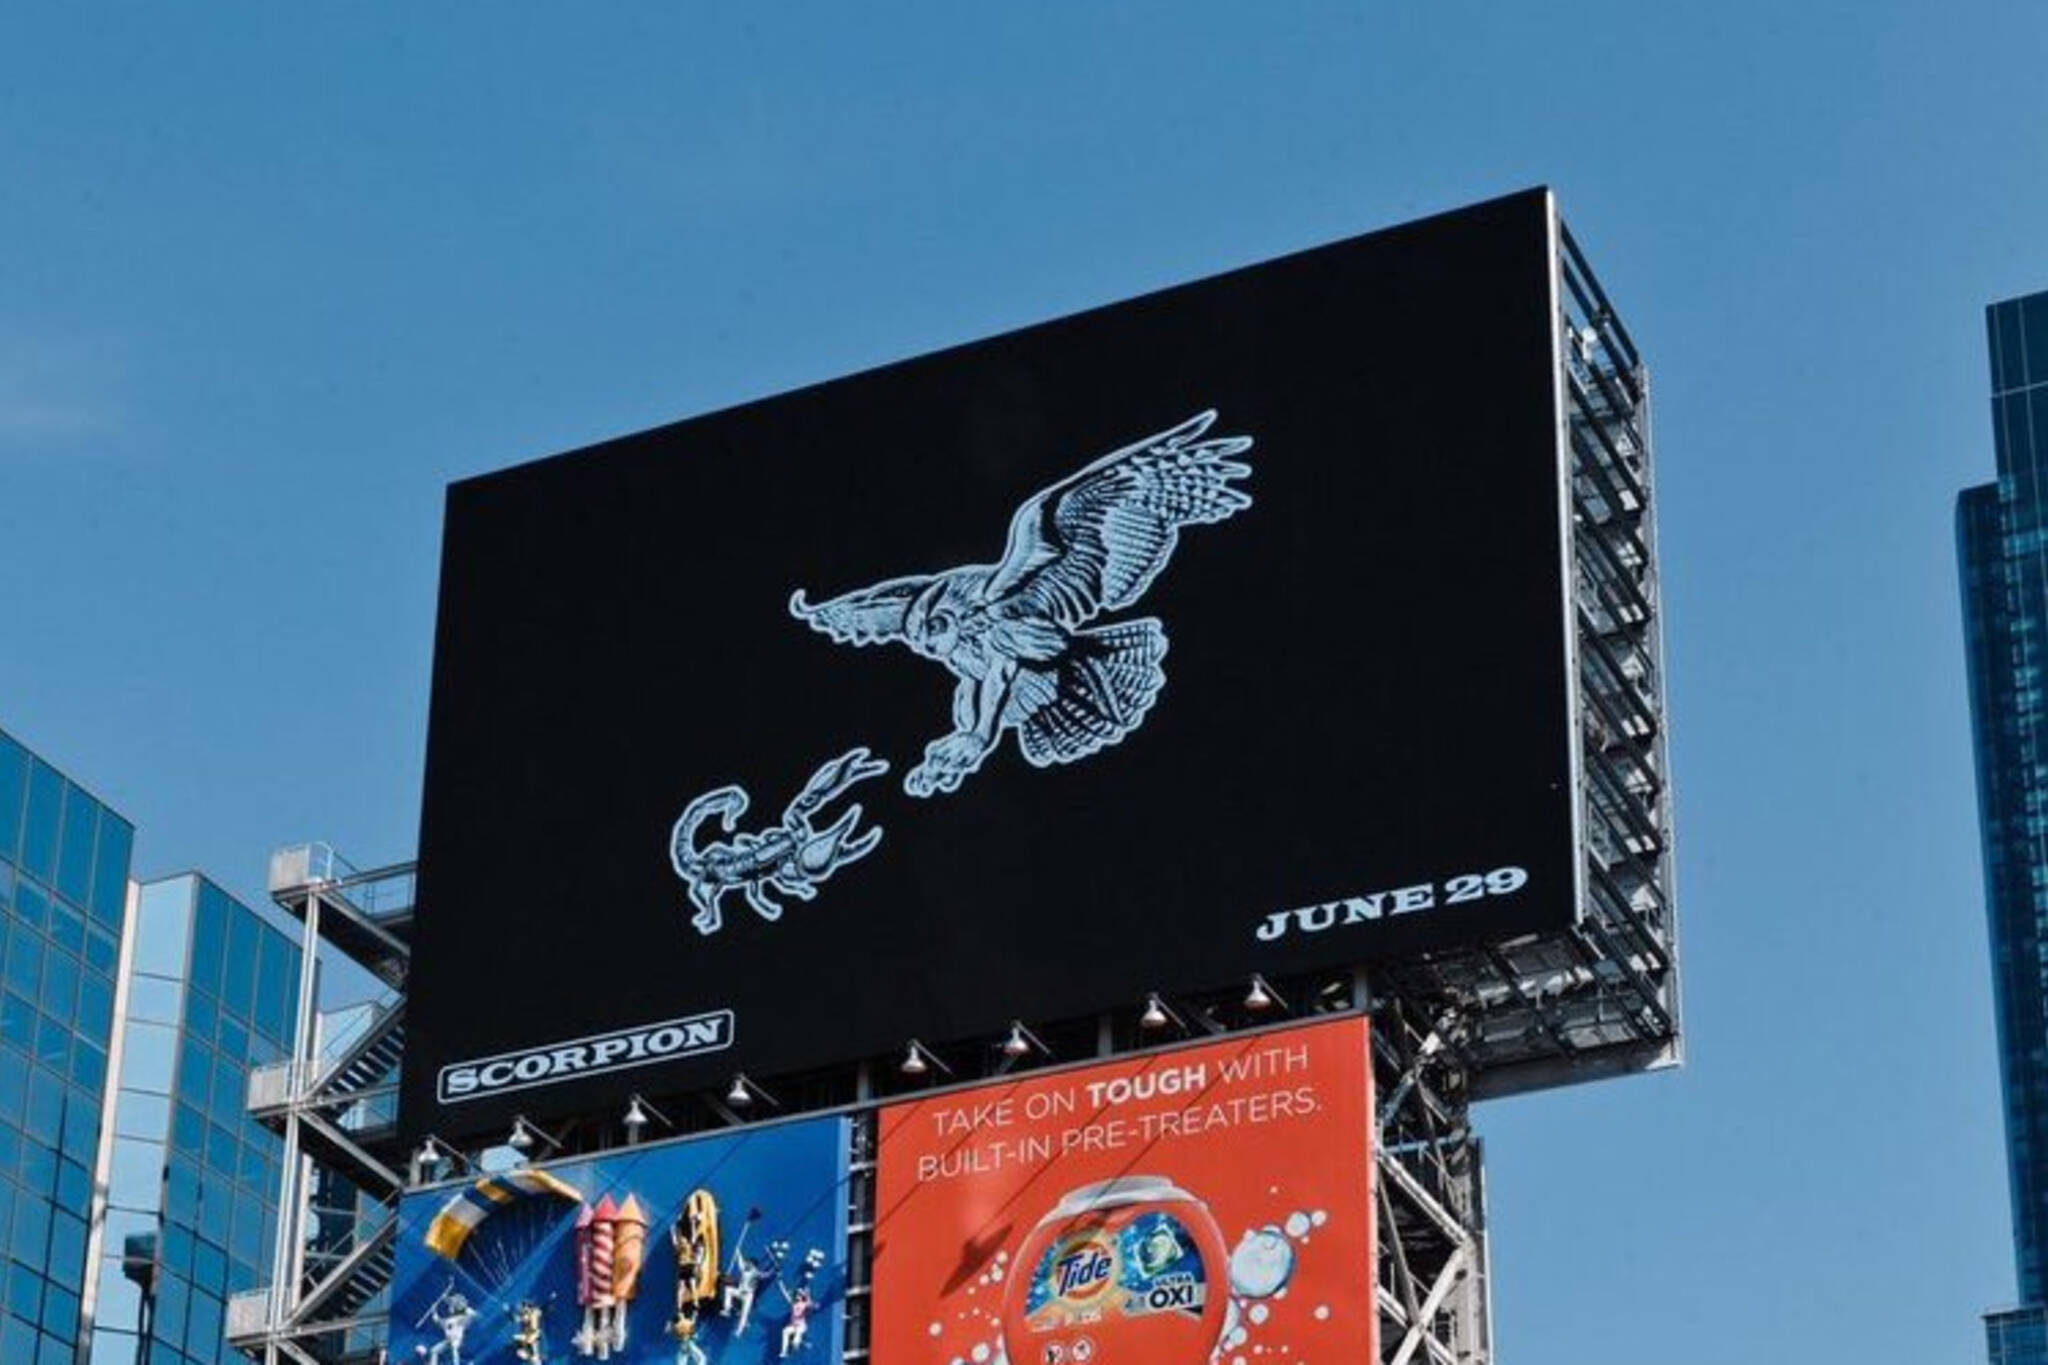 drake scorpion billboards